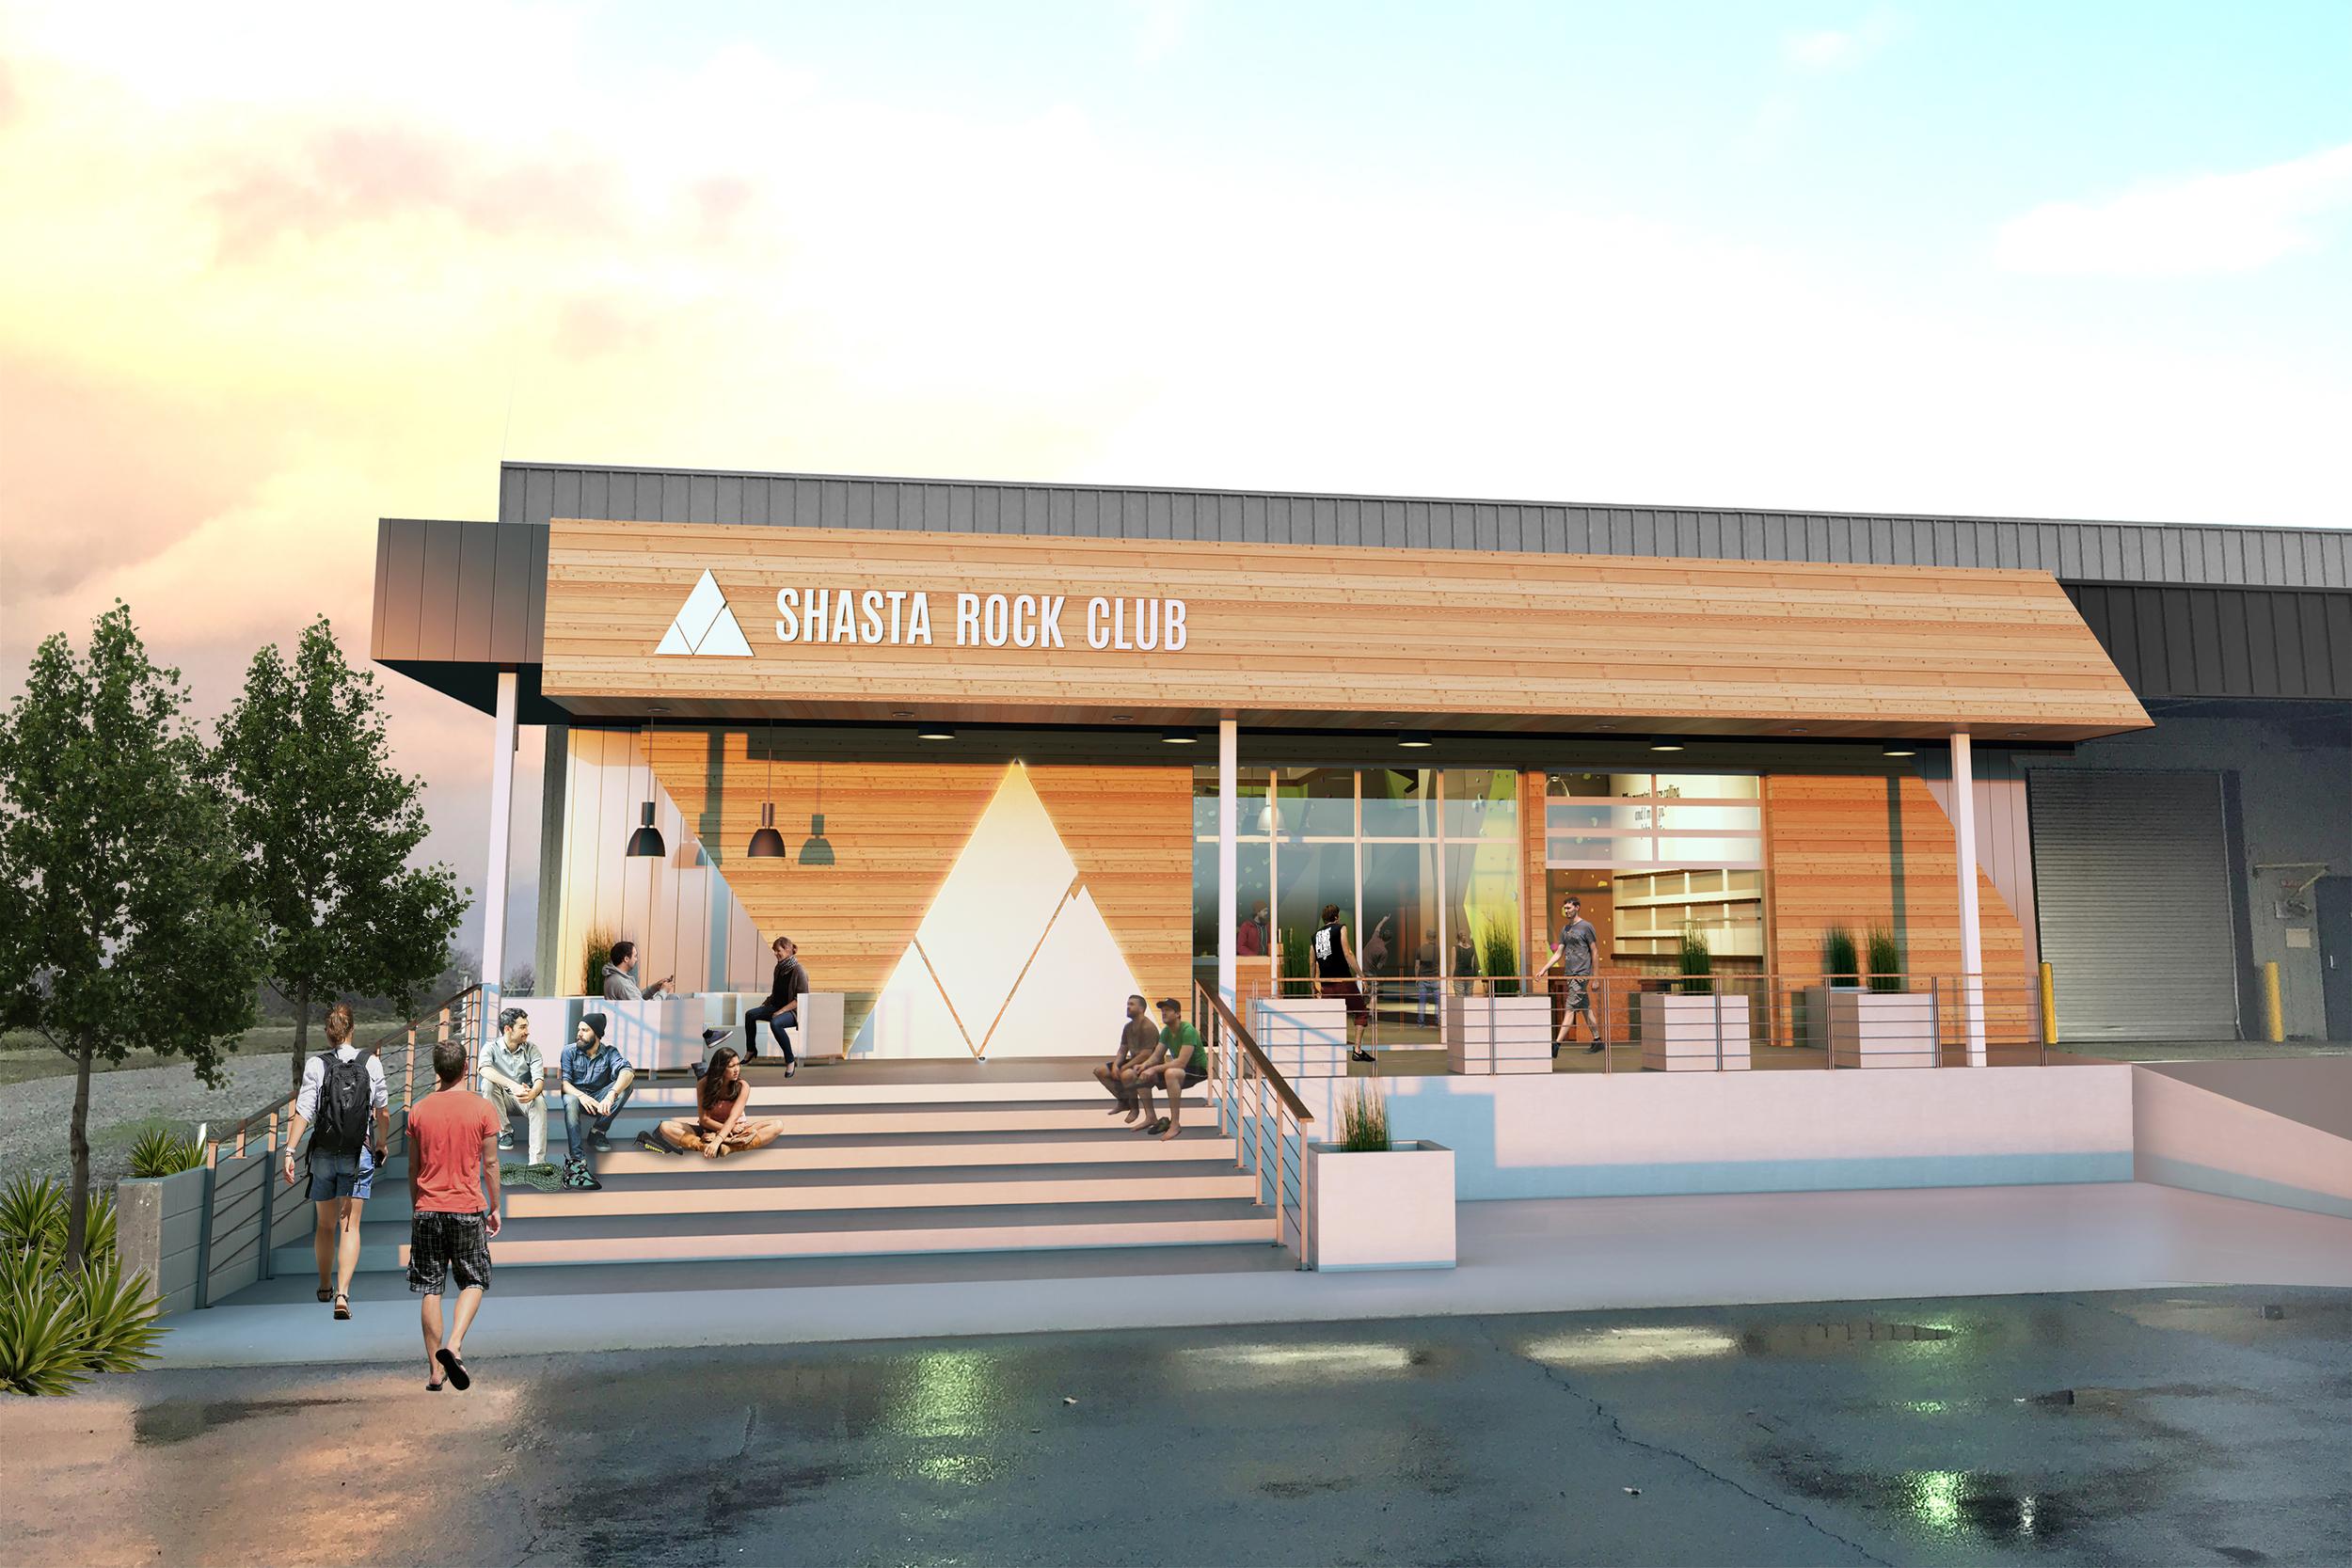 rock club_exterior_2.4.16.jpg